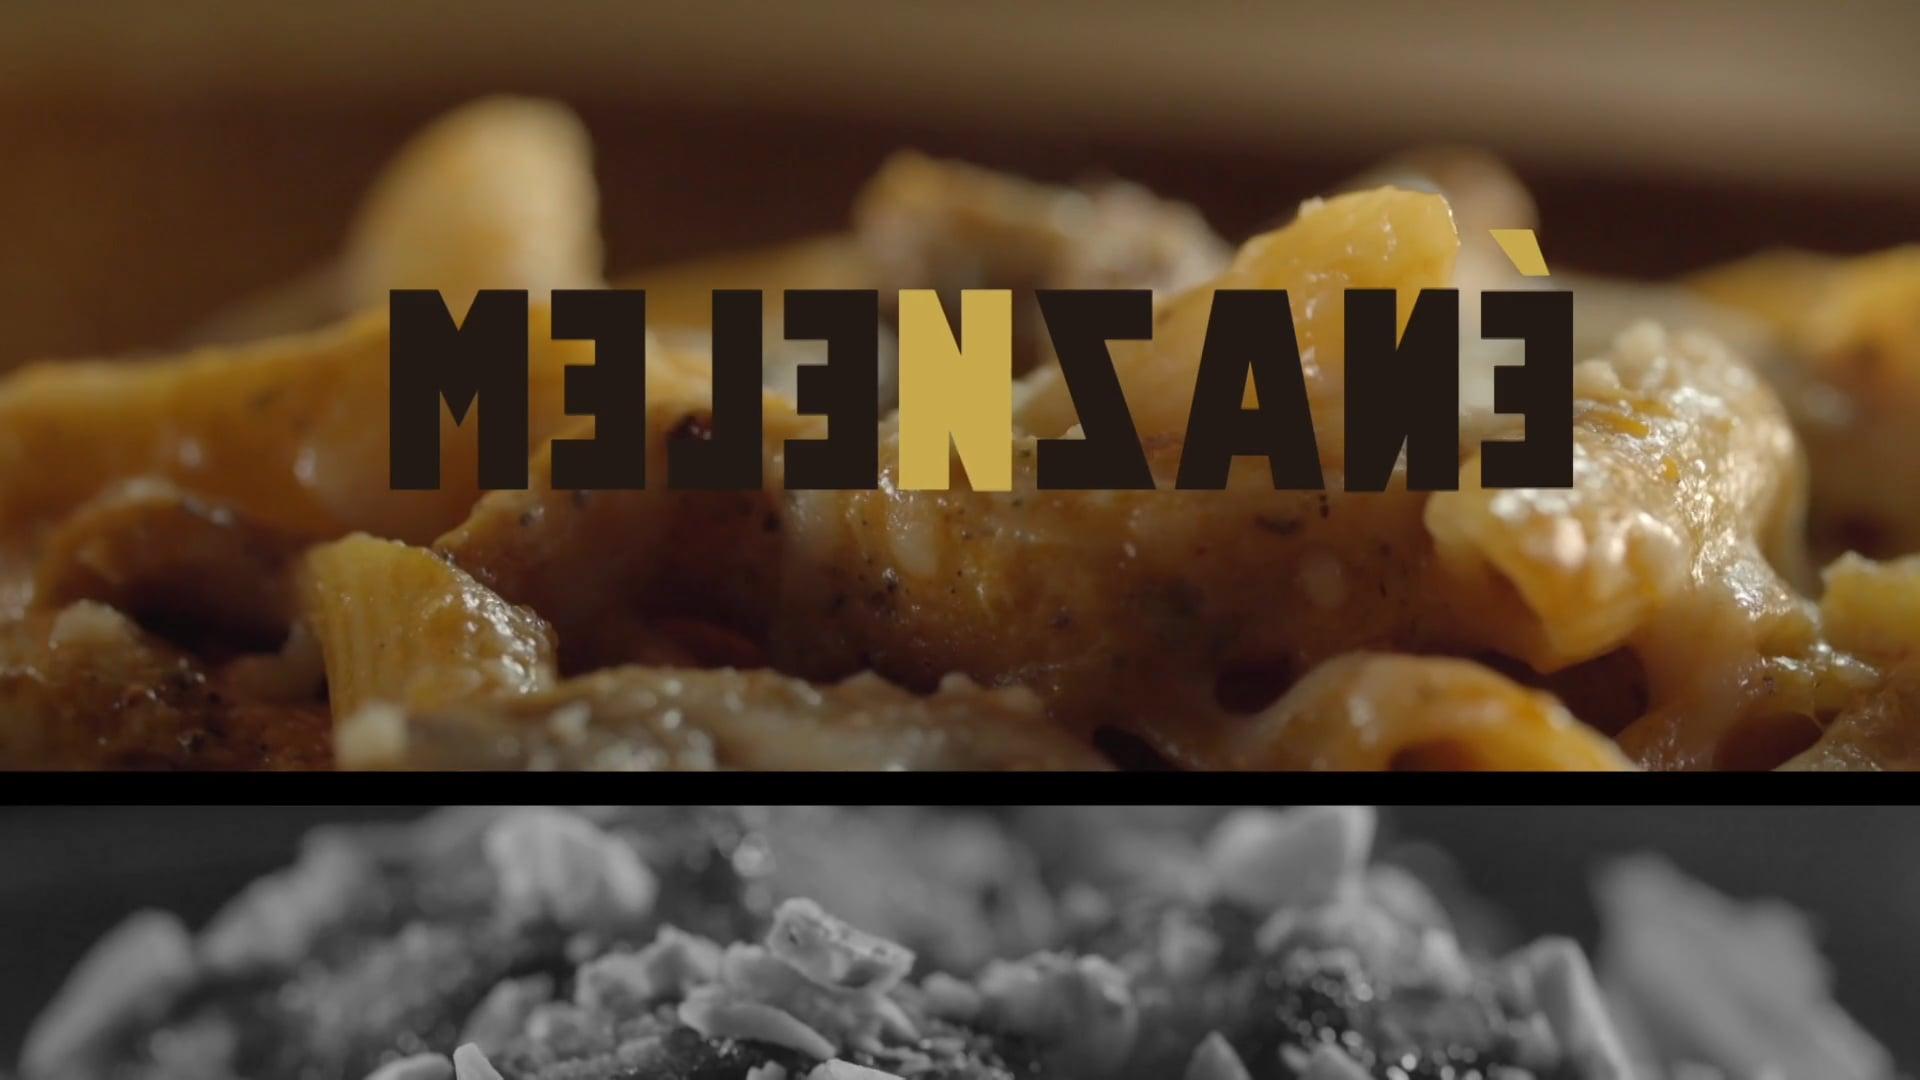 Editor - Melanzane Avenue (DK)